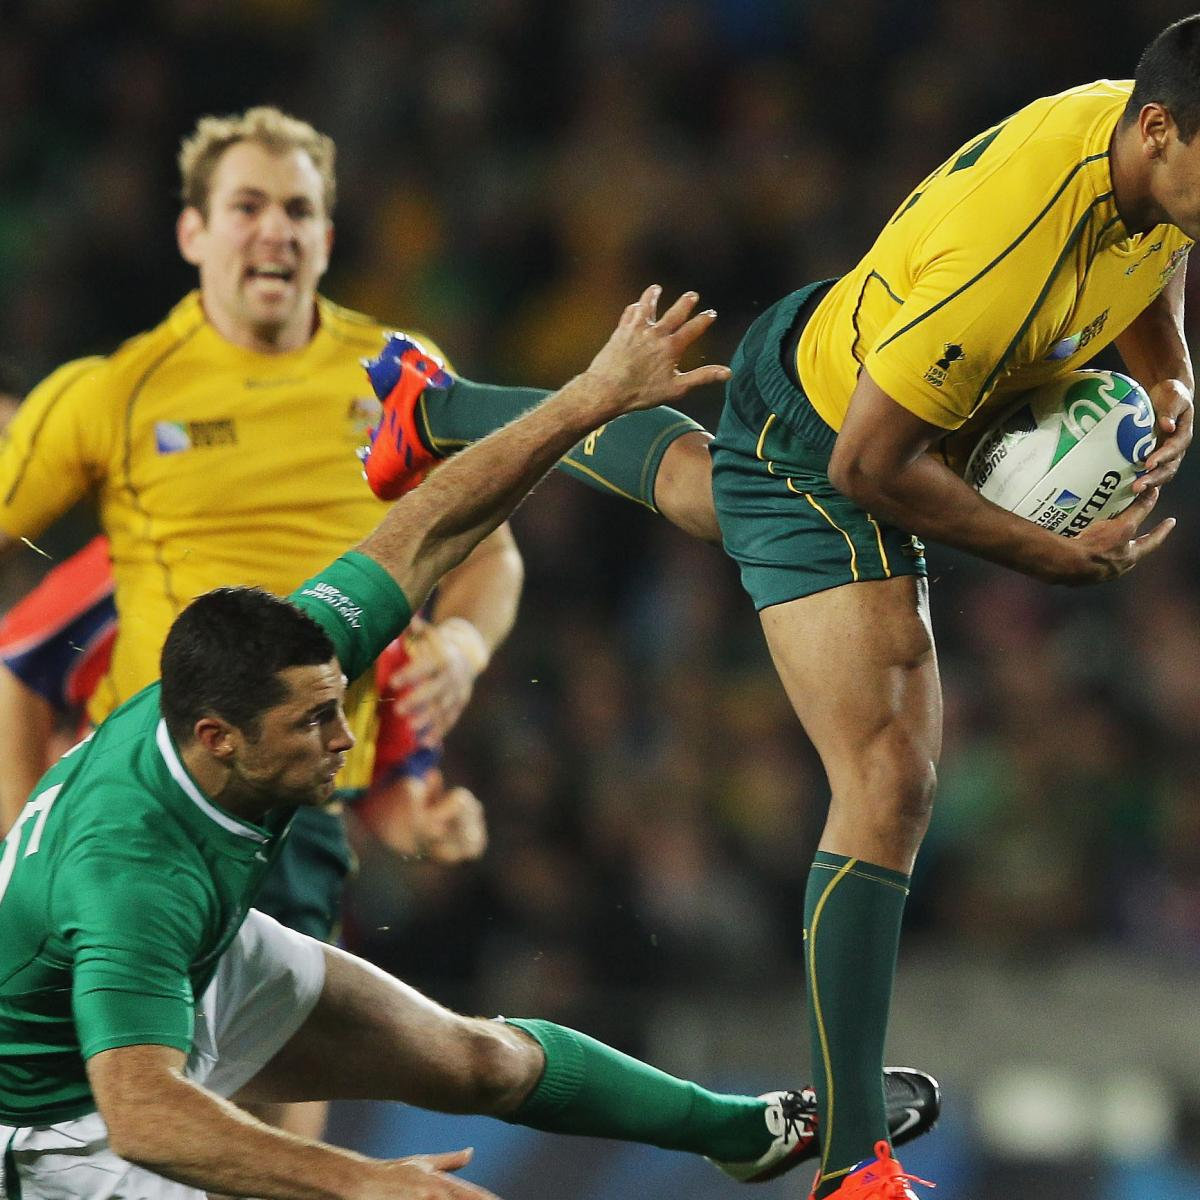 Ireland Vs. Australia Rugby 2013: Date, Time, Live Stream